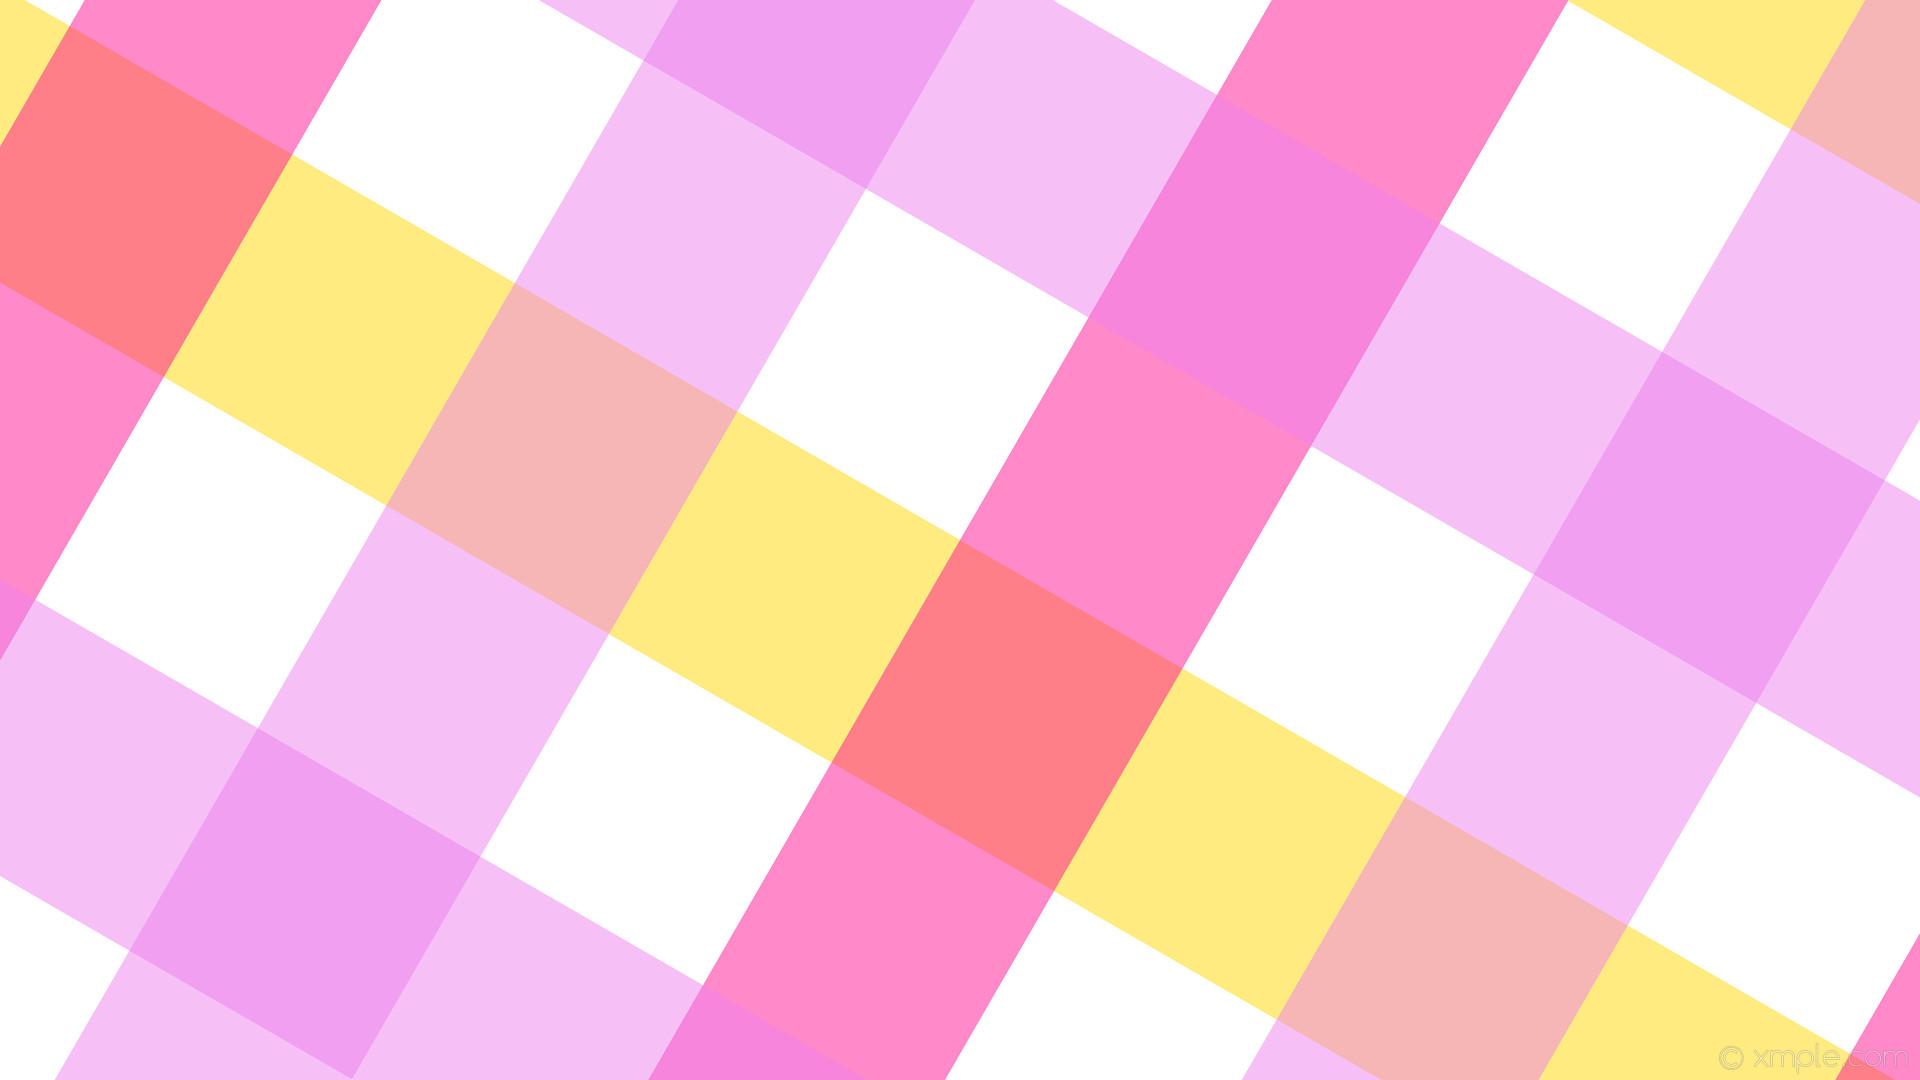 wallpaper pink yellow striped gingham white quad purple gold deep pink  violet #ffffff #ffd700